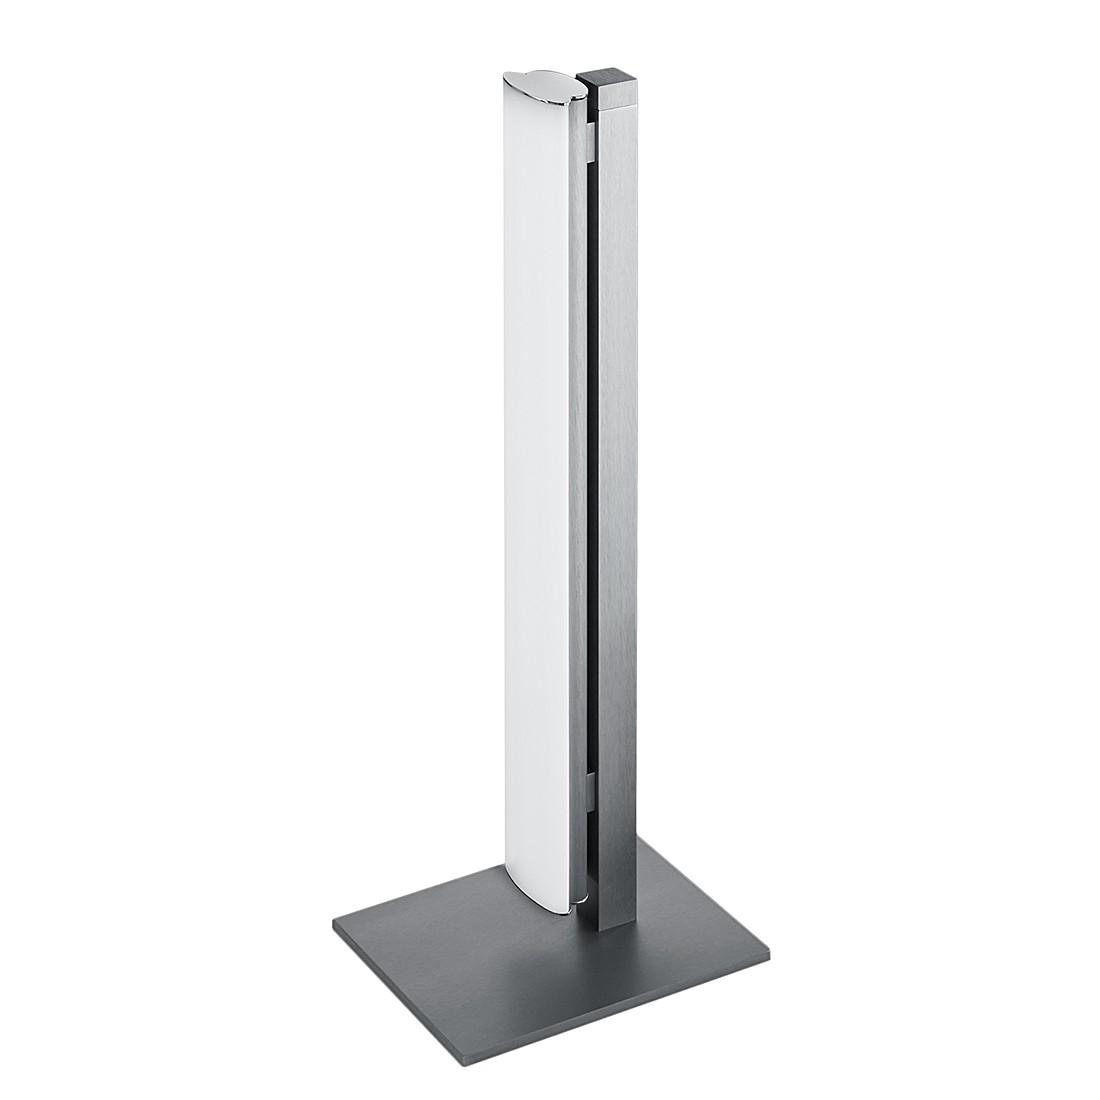 EEK A+, Lampe de table VENTA - Métal / Matériau synthétique Argenté, Helestra